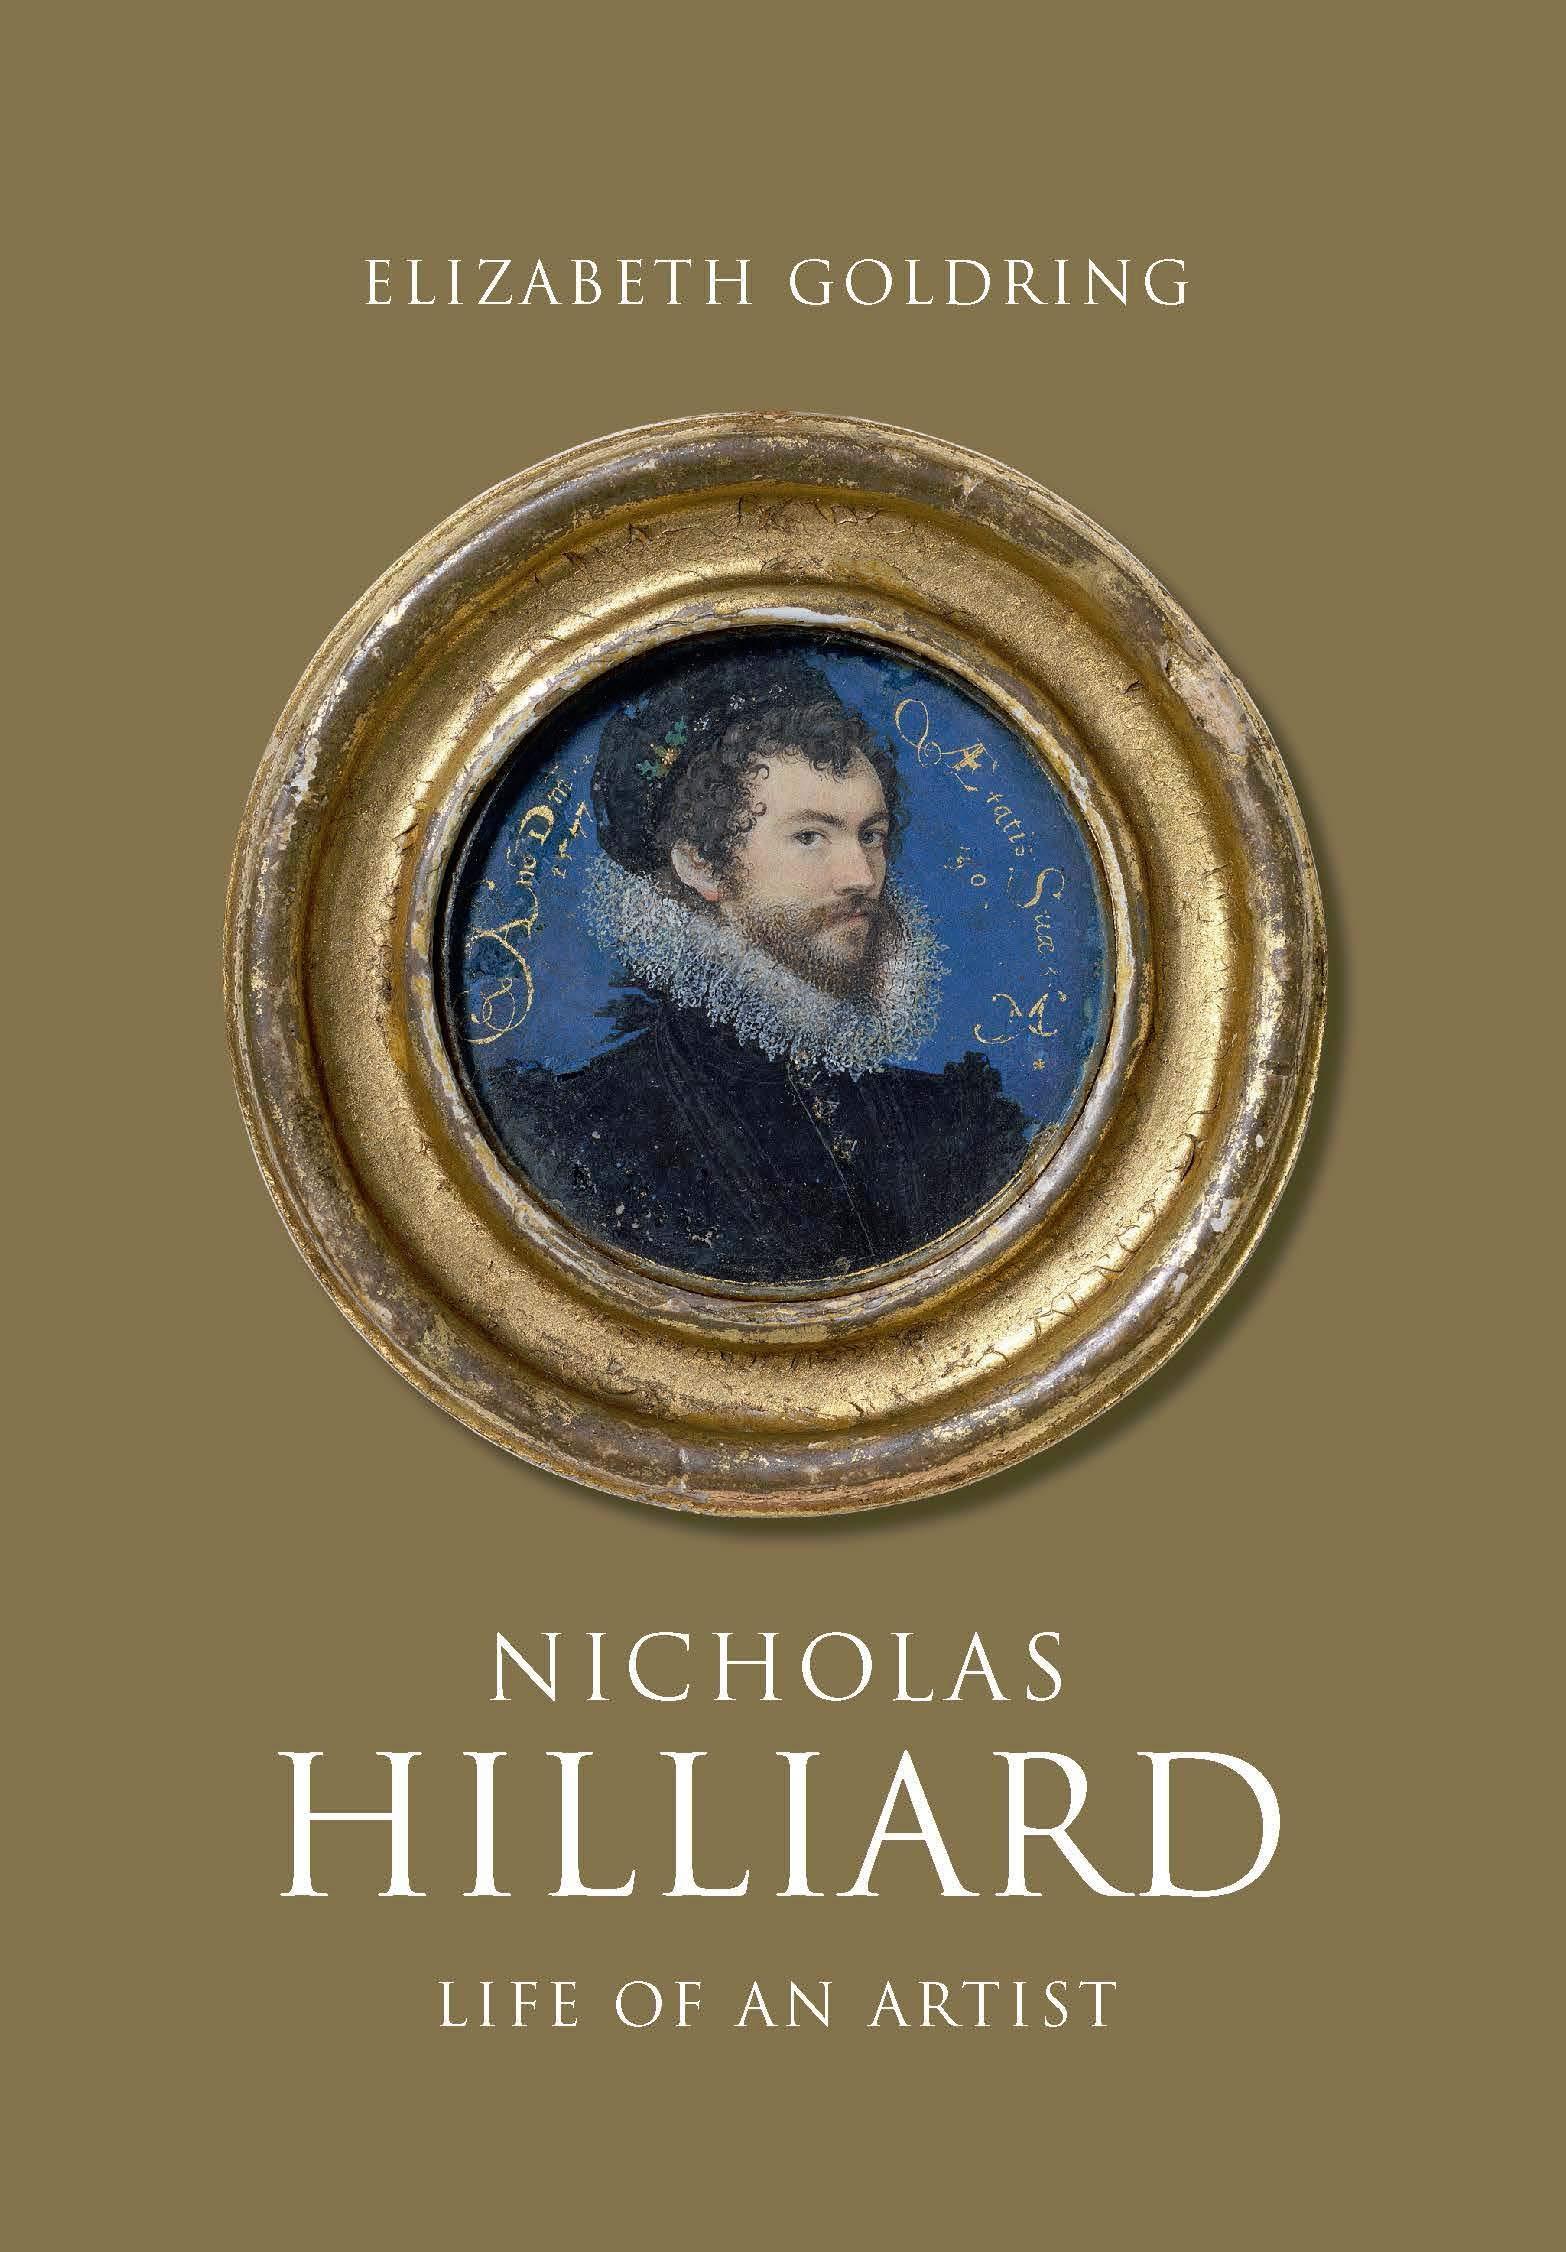 Nicholas Hilliard: Life of an Artist (The Paul Mellon Centre for Studies in British Art) por Elizabeth Goldring